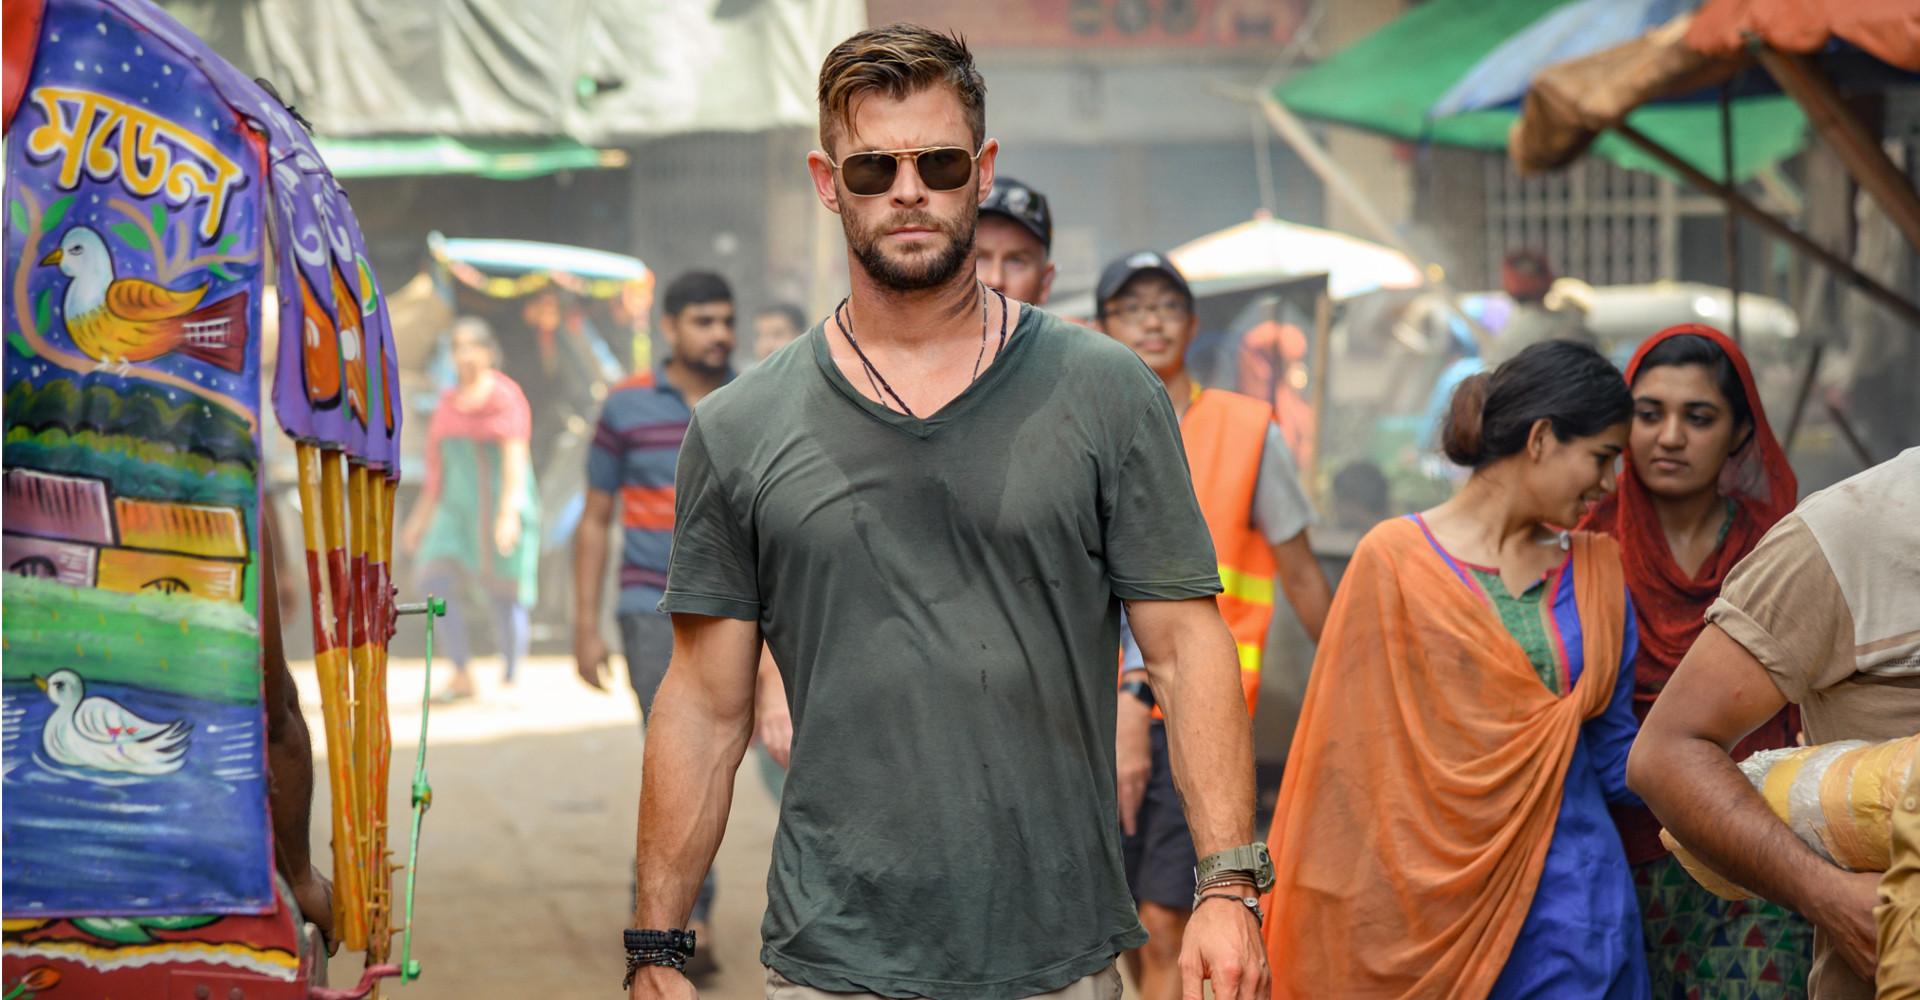 Chris Hemsworth in Tyler Rake: Extraction